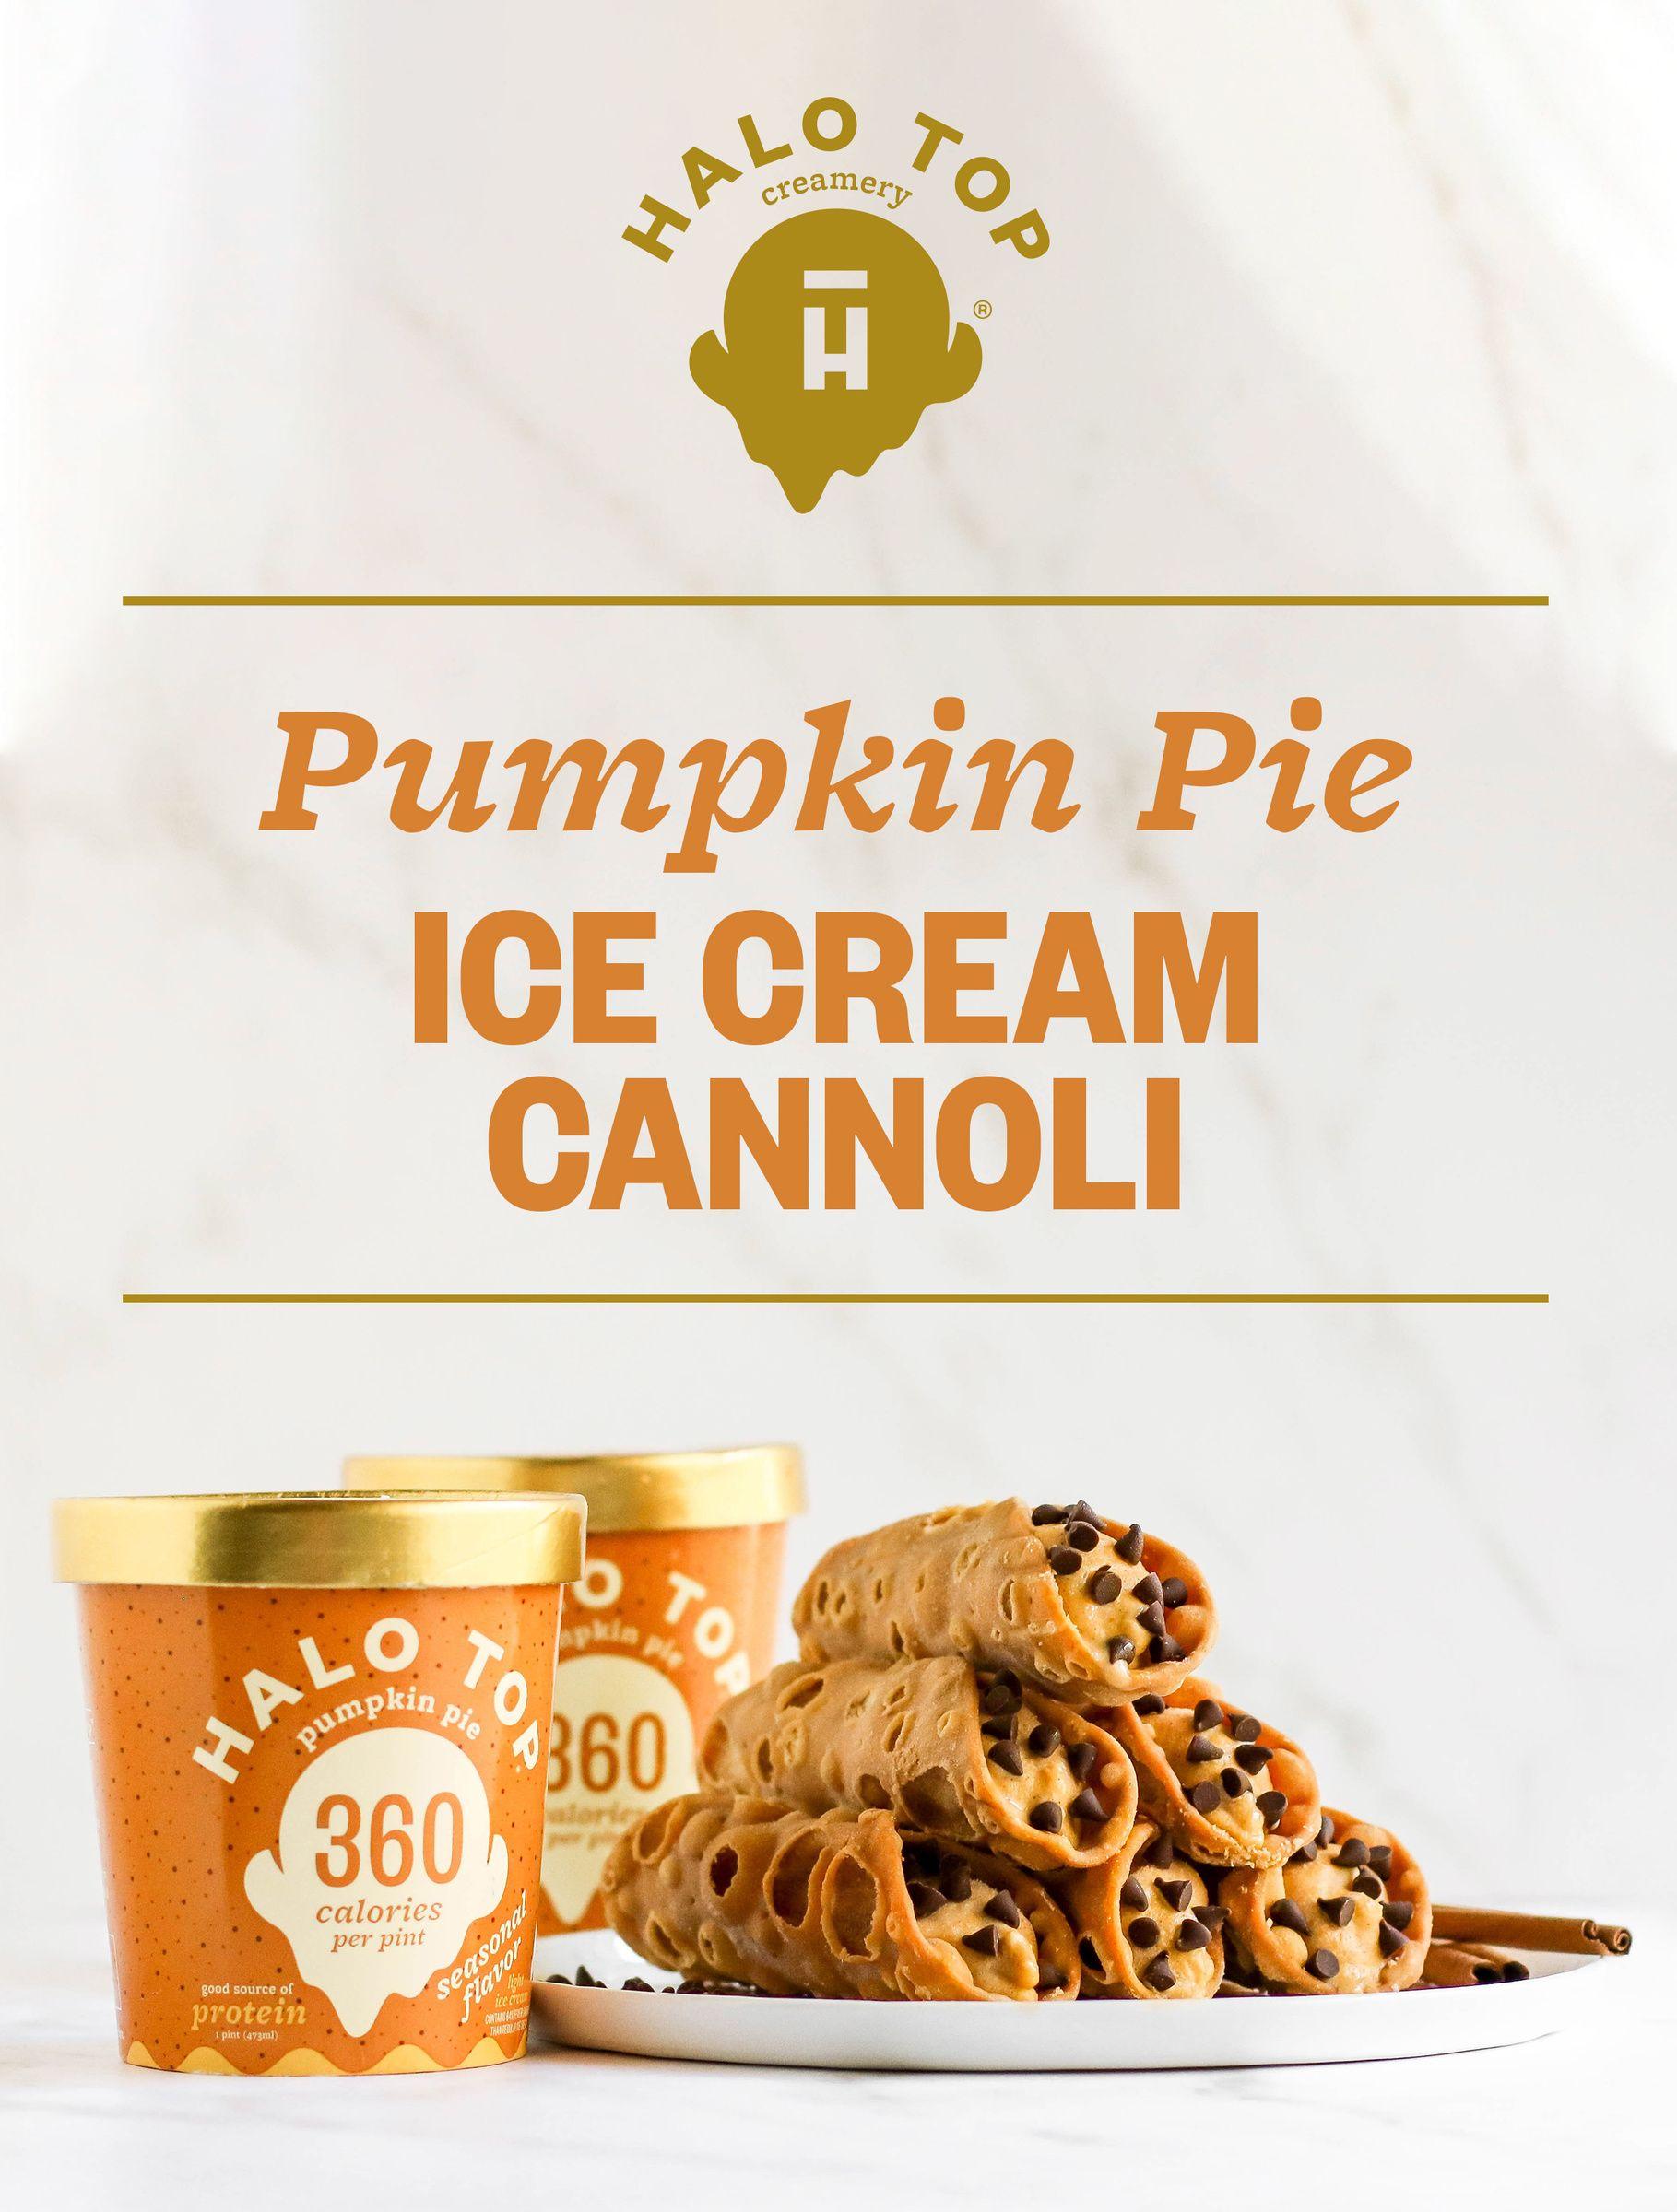 Pumpkin Pie Cannolis Recipe Pumpkin Pie Pumpkin Pie Ice Cream Recipes